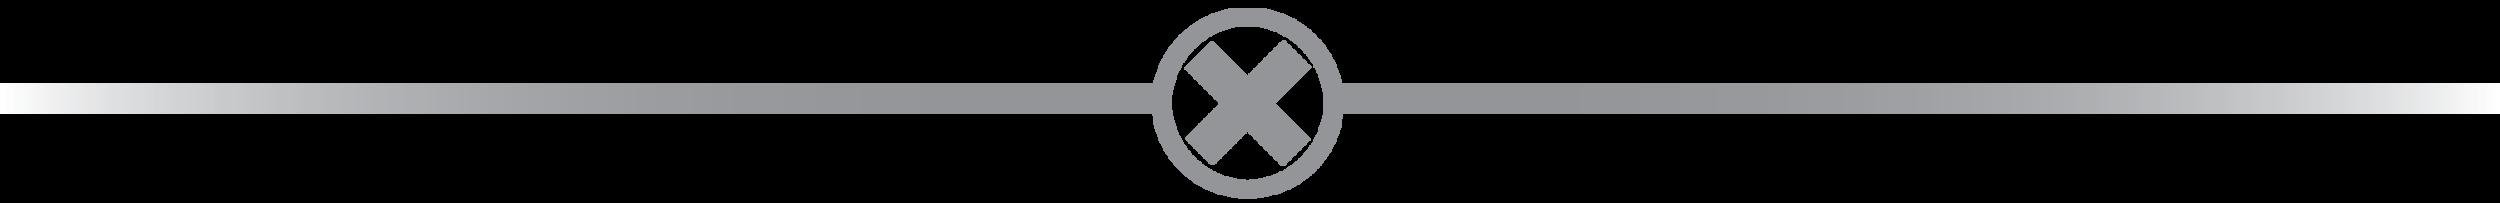 Exponential Media Logo xline-02.png